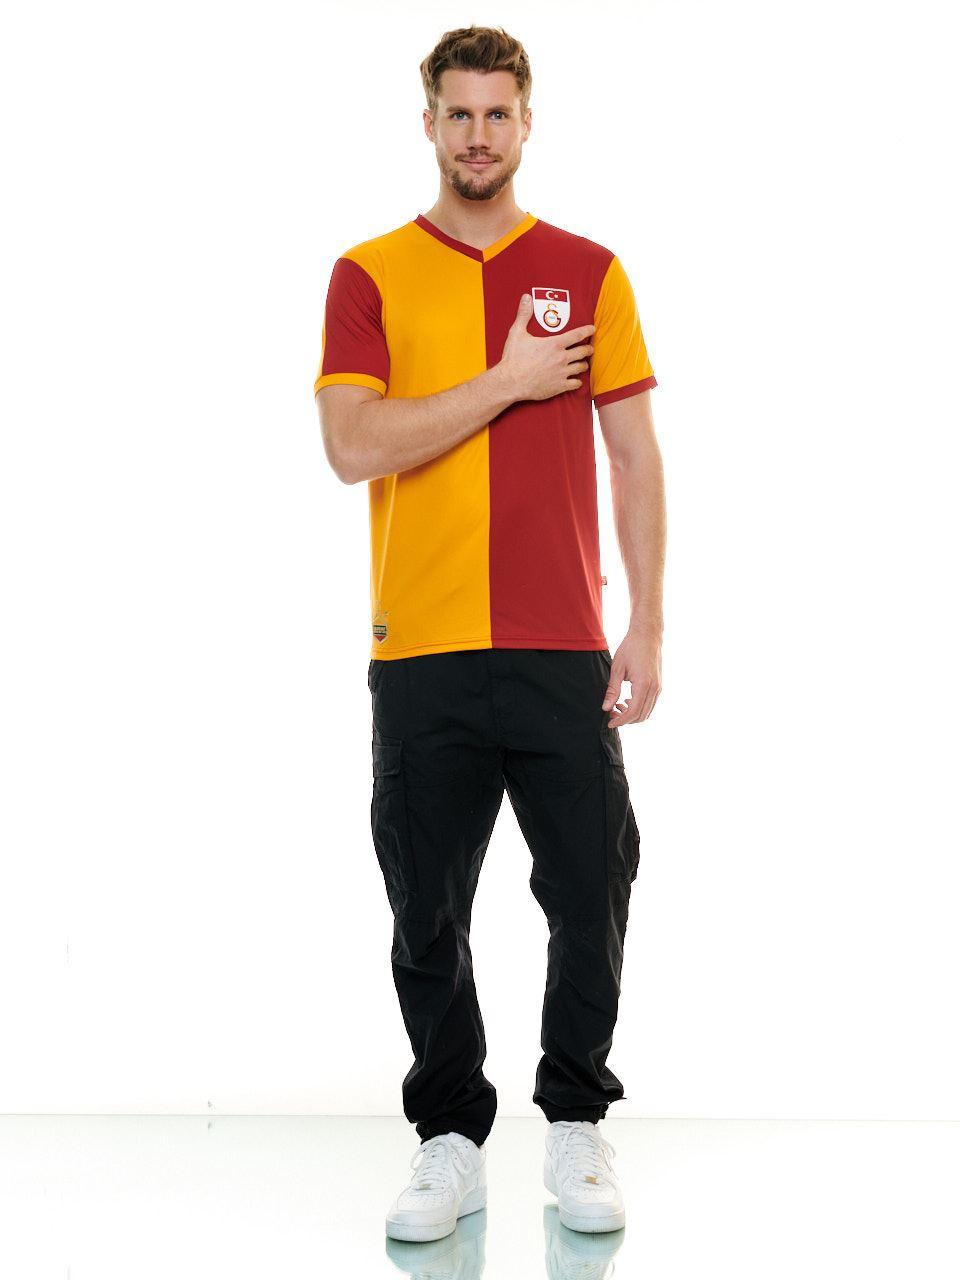 E88107 Metin Oktay Taraftar T-shirt